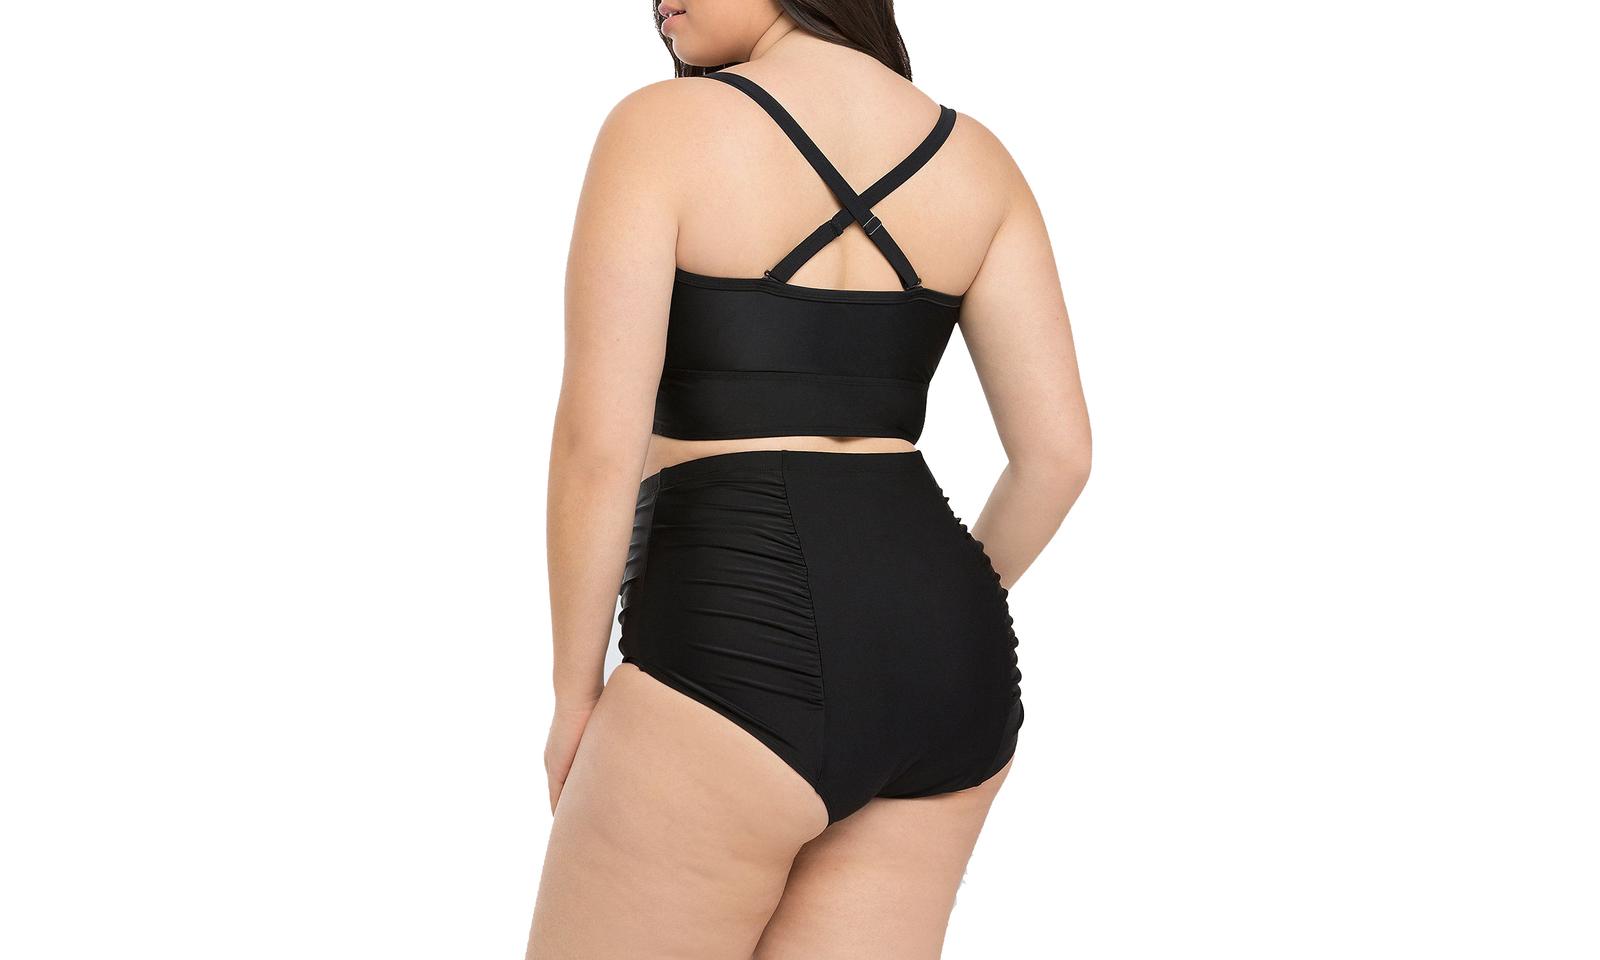 Women's Ruched High Waist Two Pieces Bikini Set